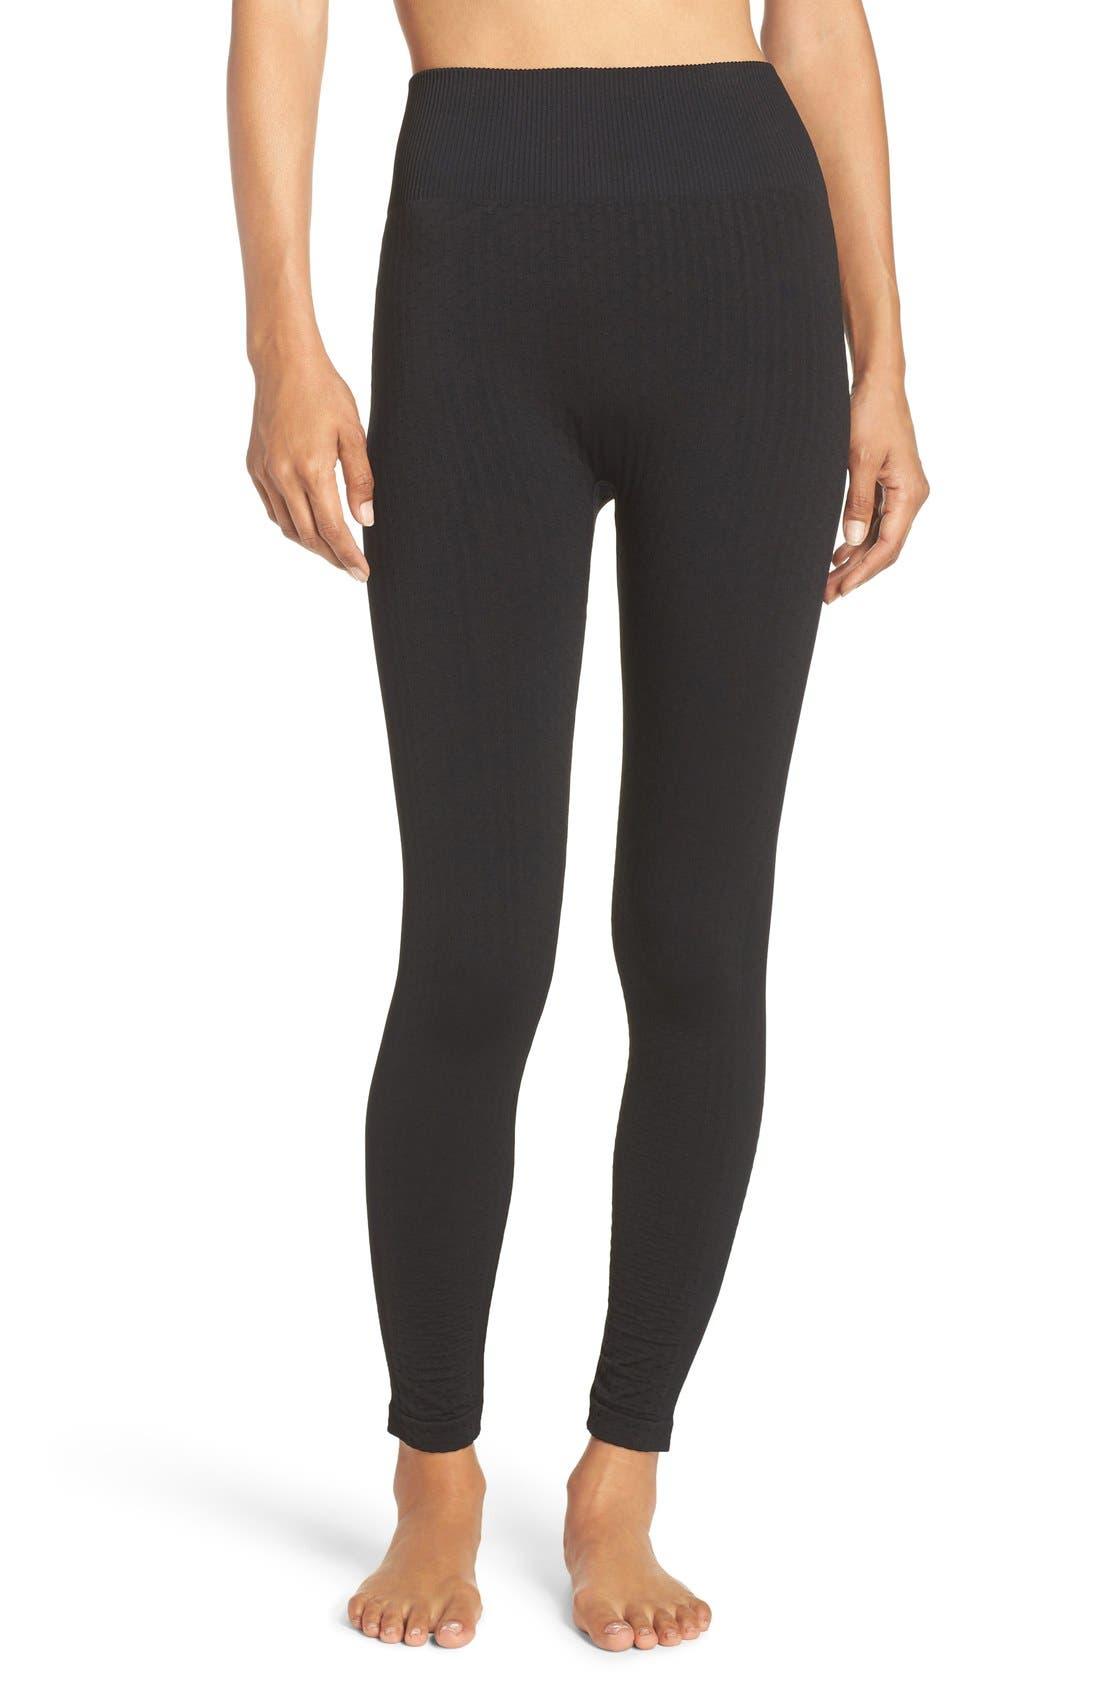 Main Image - Climawear 'Trail Blazer' High Waist Leggings